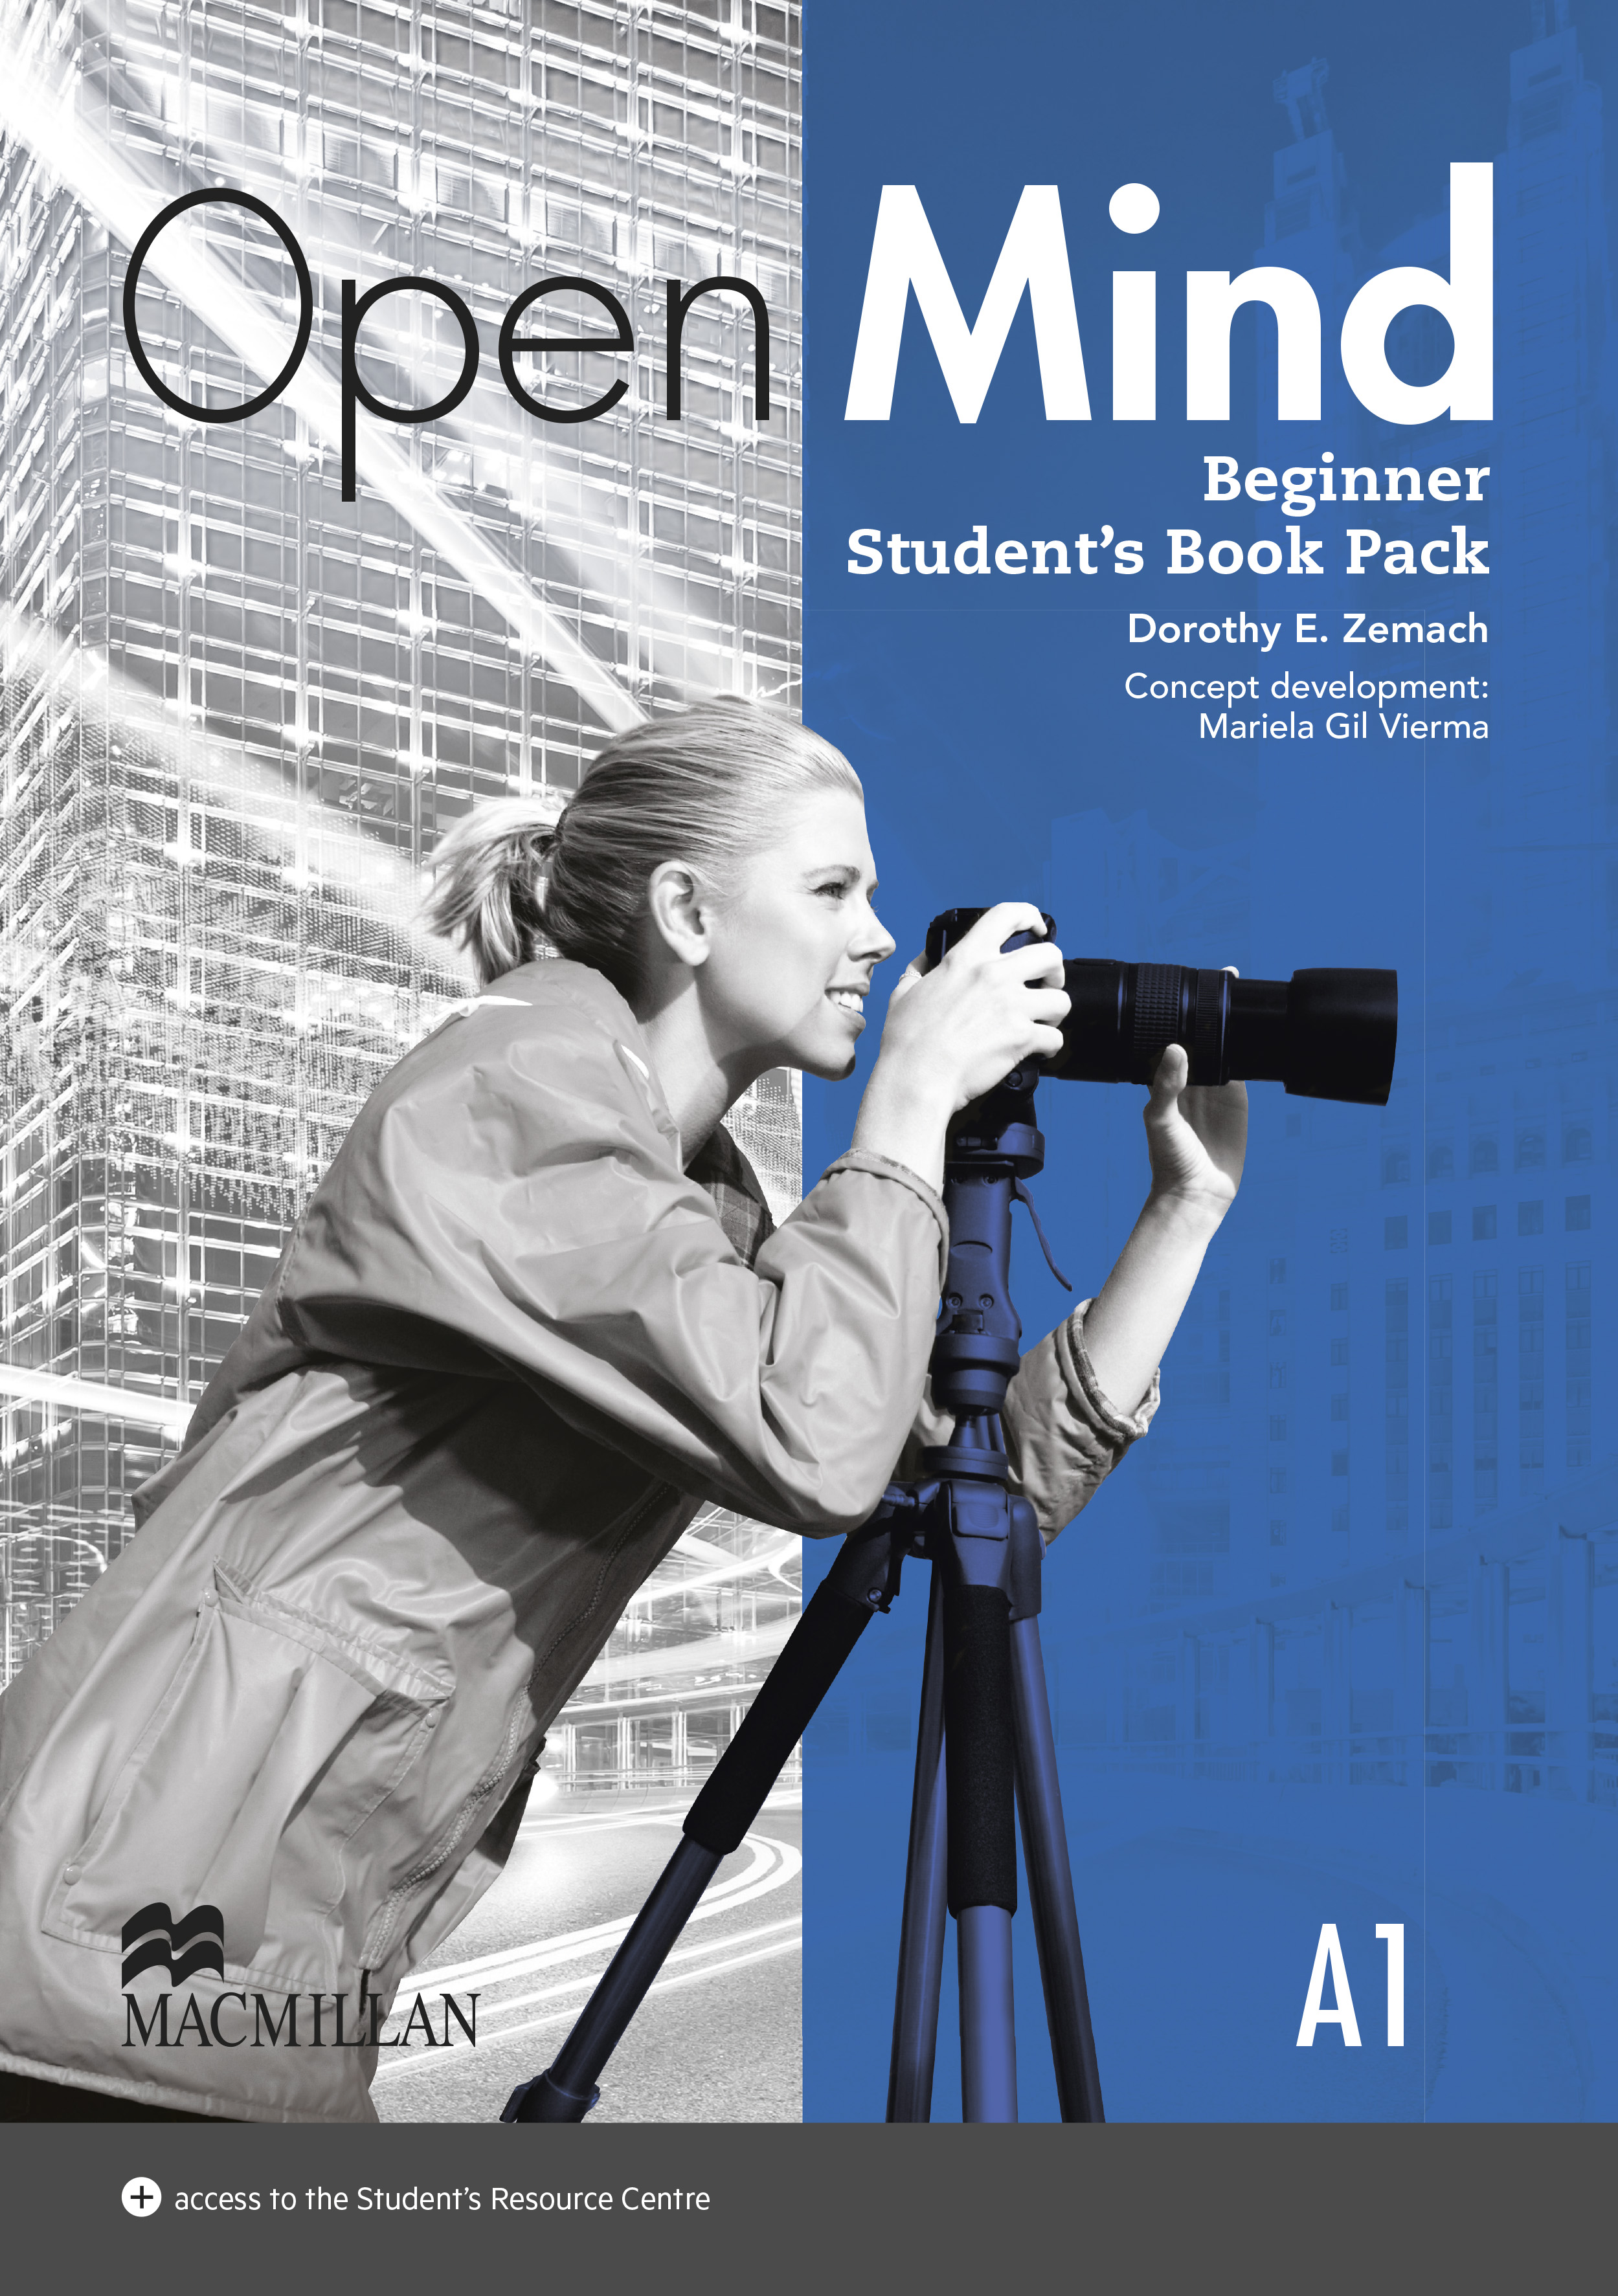 Open Mind Beginner Student